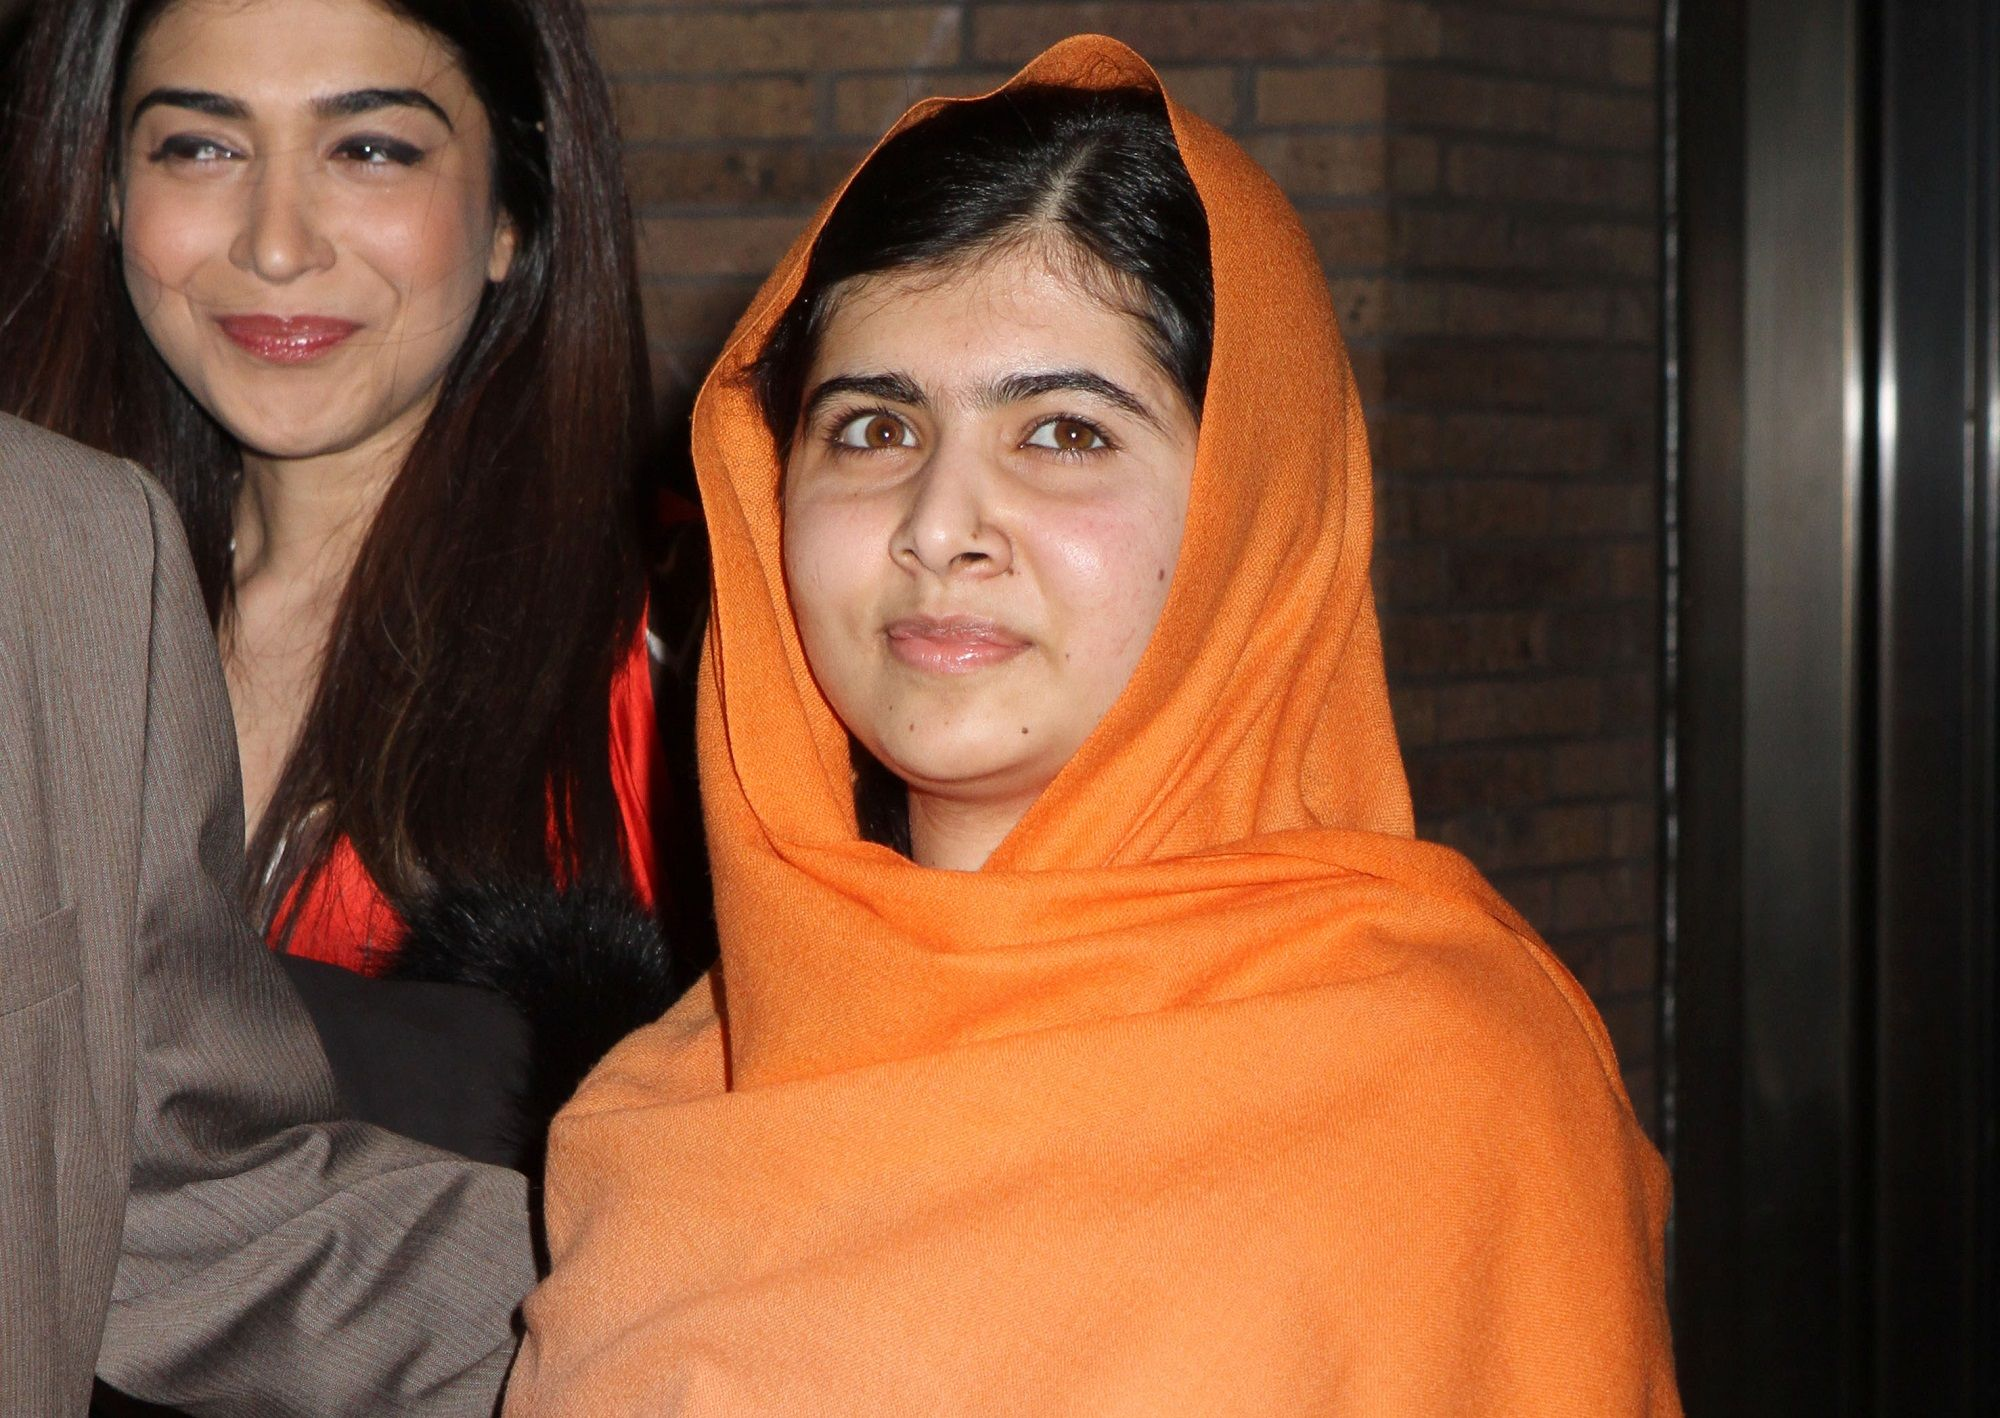 10. Malala Yousafzai